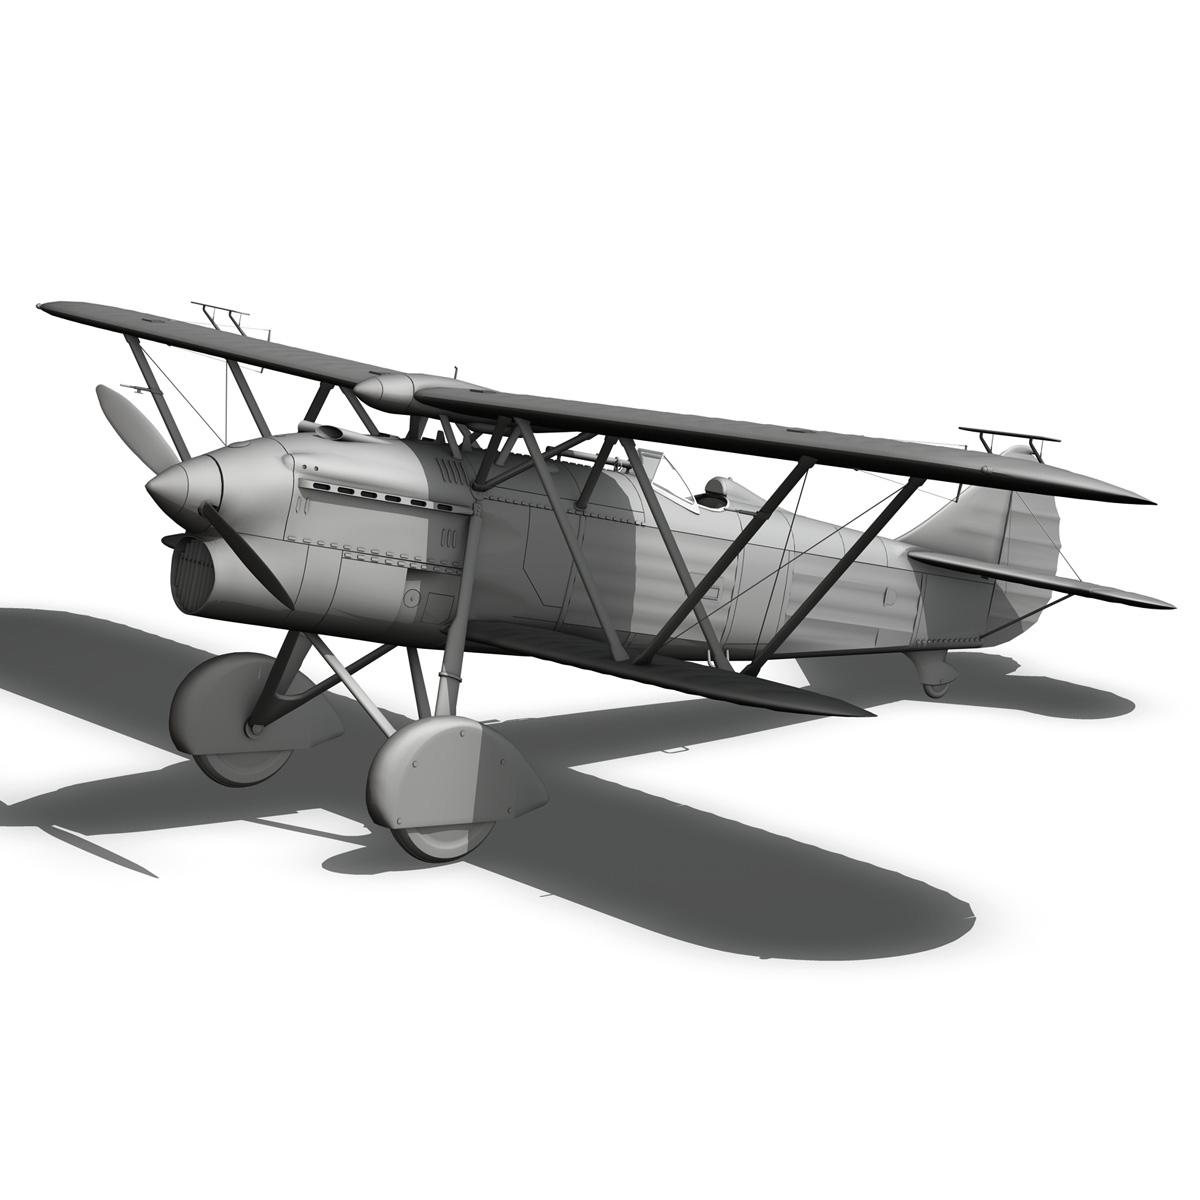 fiat cr.32 – chinese nationalist air force 3d model fbx c4d lwo obj 272643